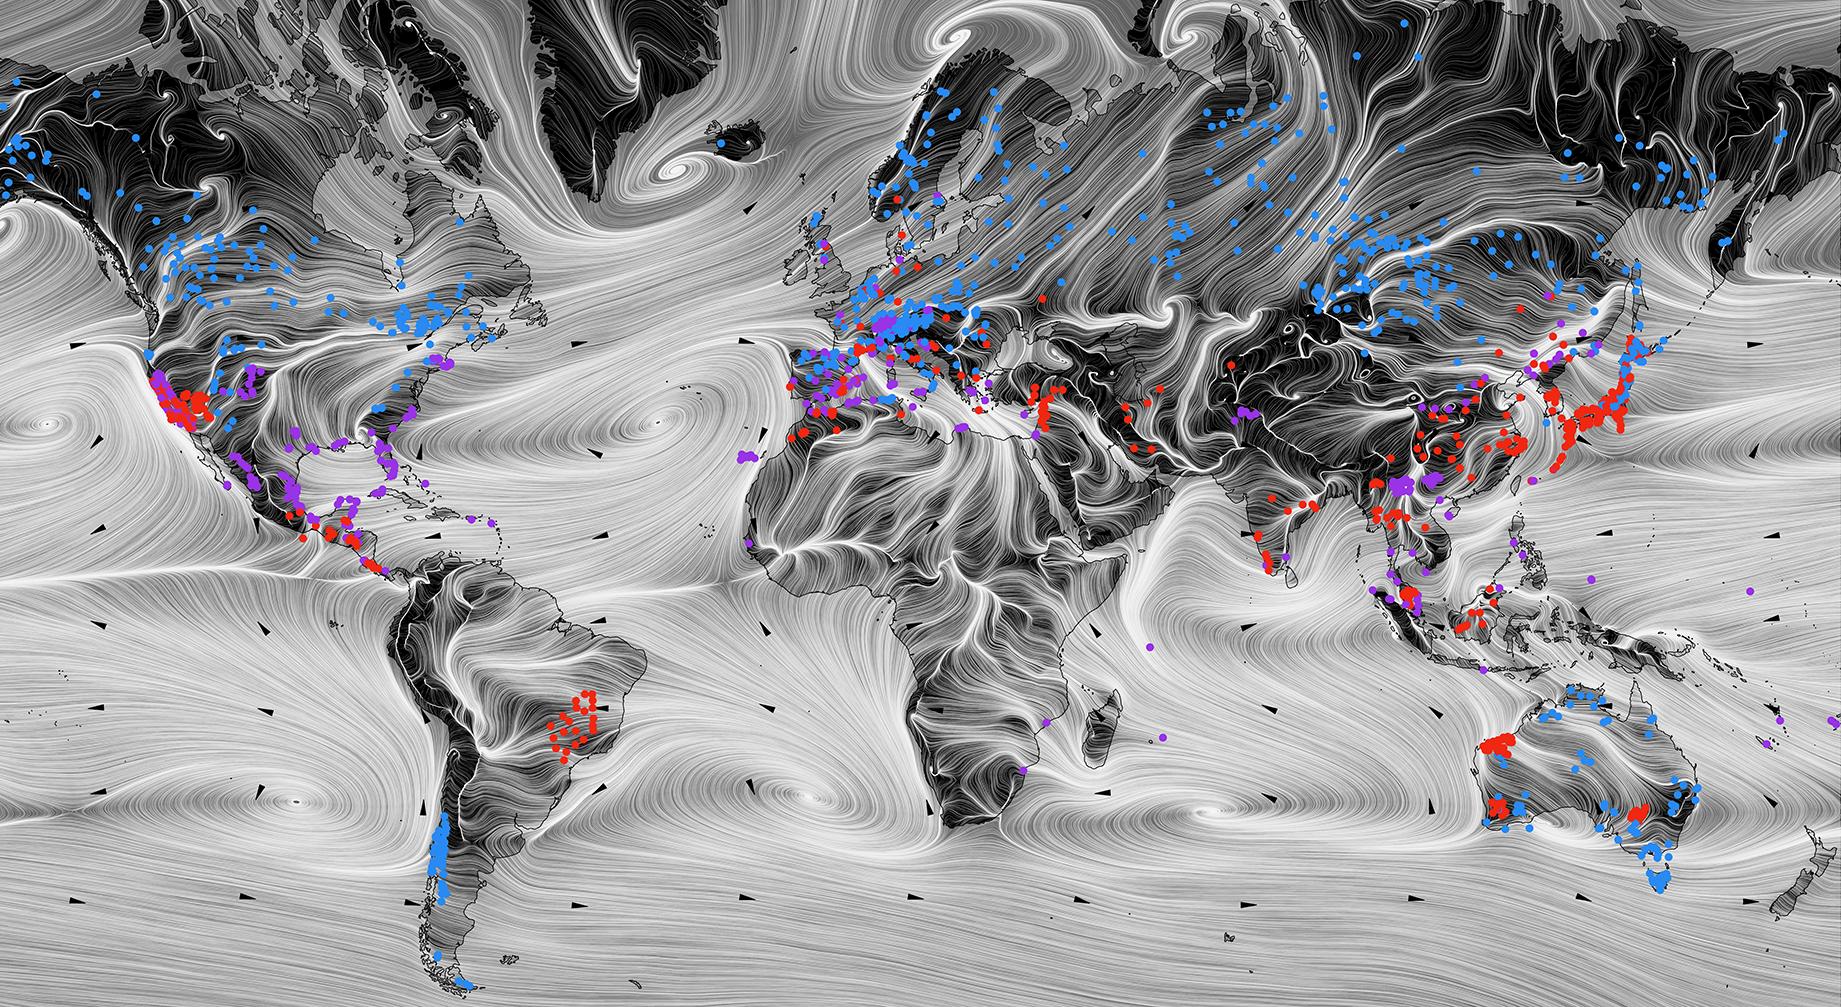 a visualization of wind patterns